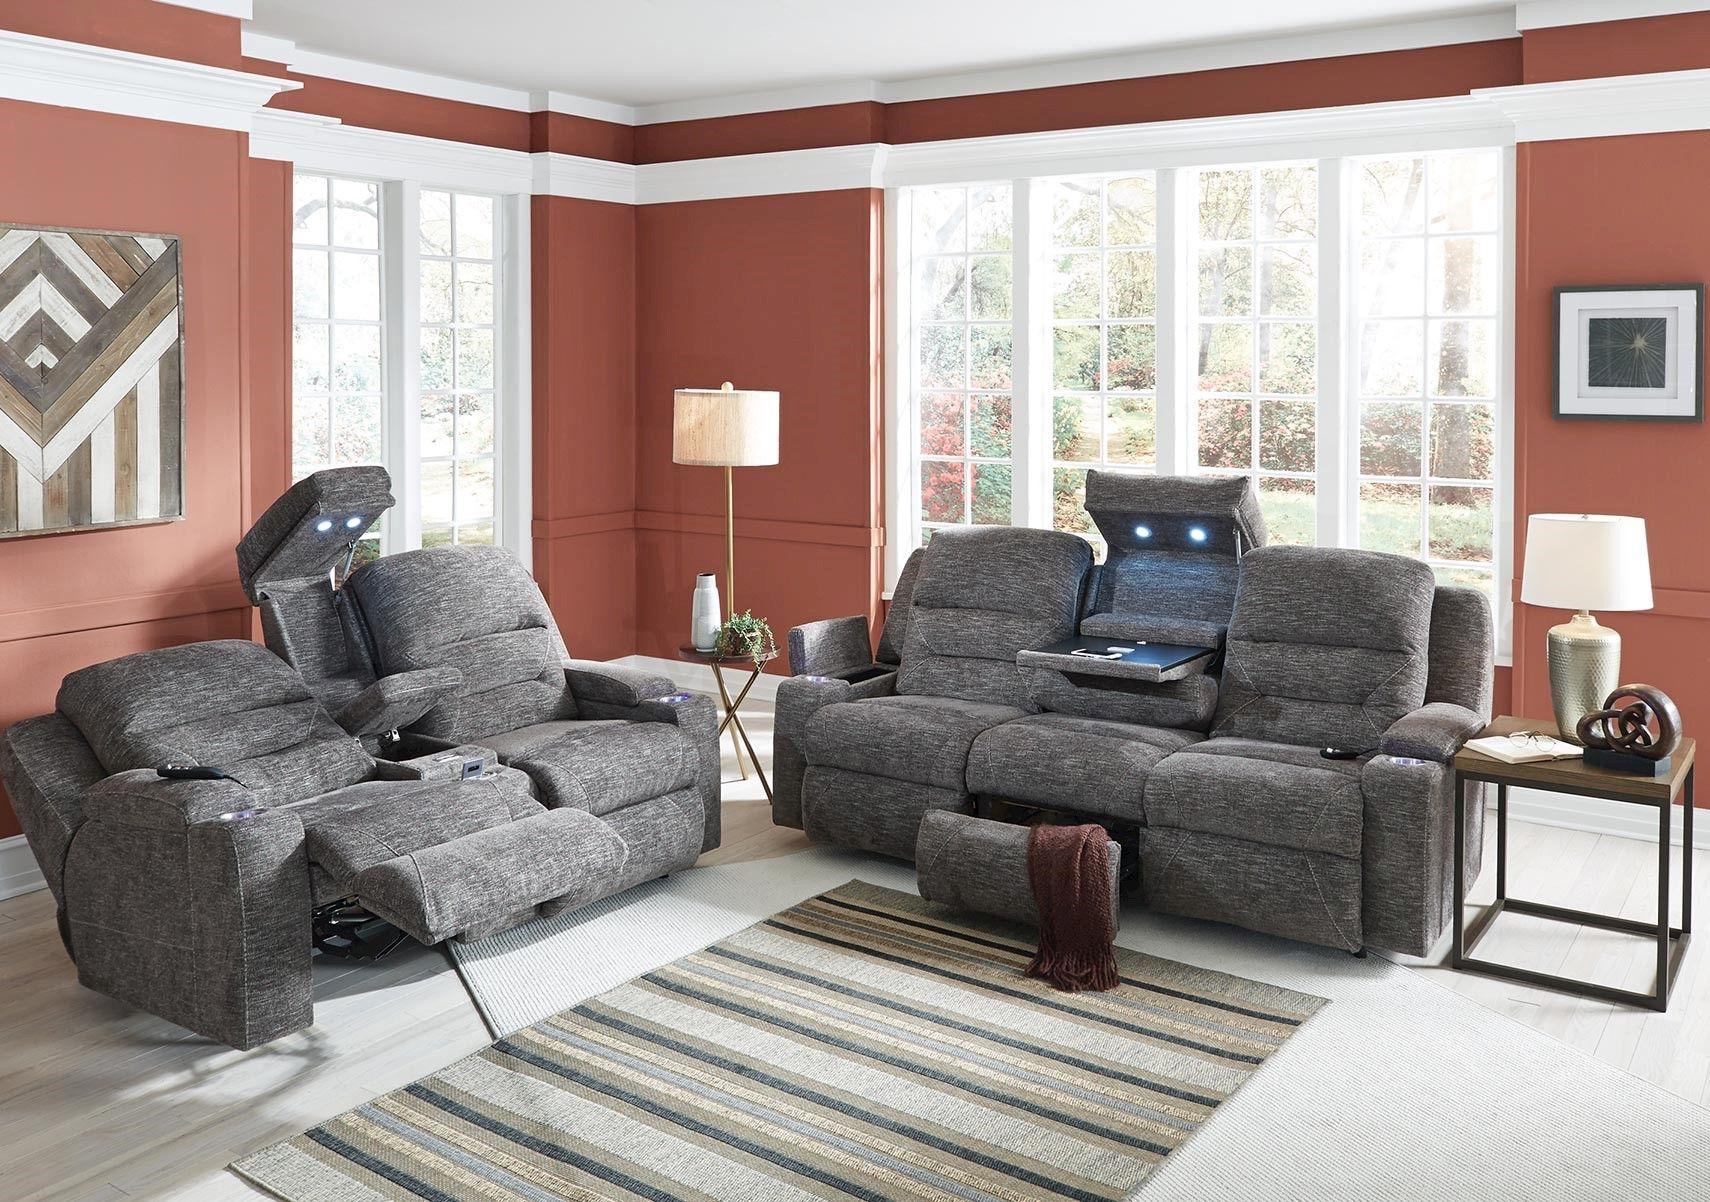 10 Most Popular Power Living Room Set